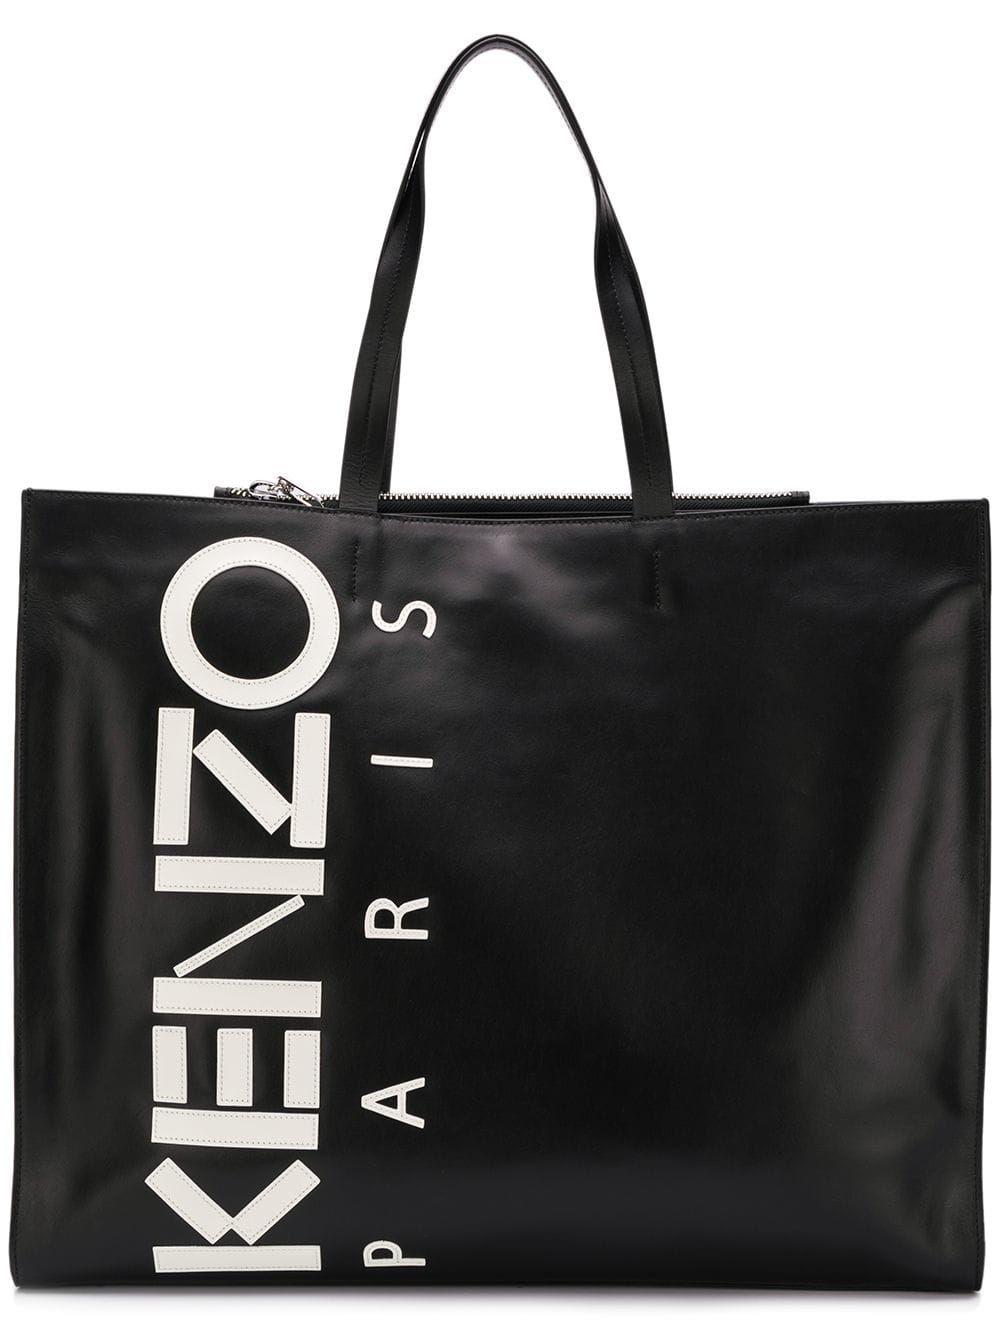 Kenzo Black Leather Tote